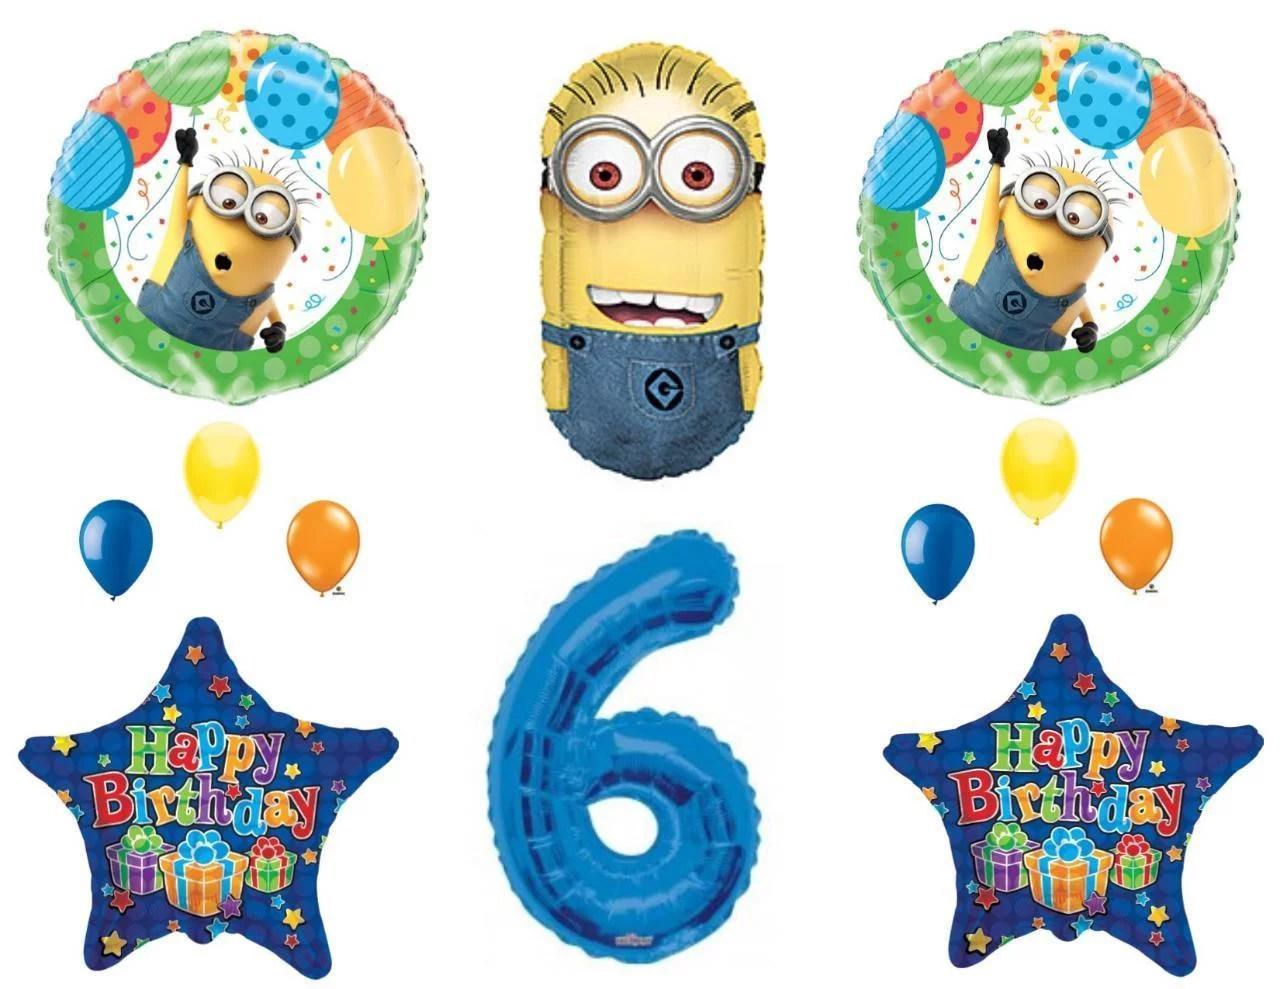 6th Despicable Me Minions Happy Birthday Party Balloons Decorations Supplies Walmart Com Walmart Com